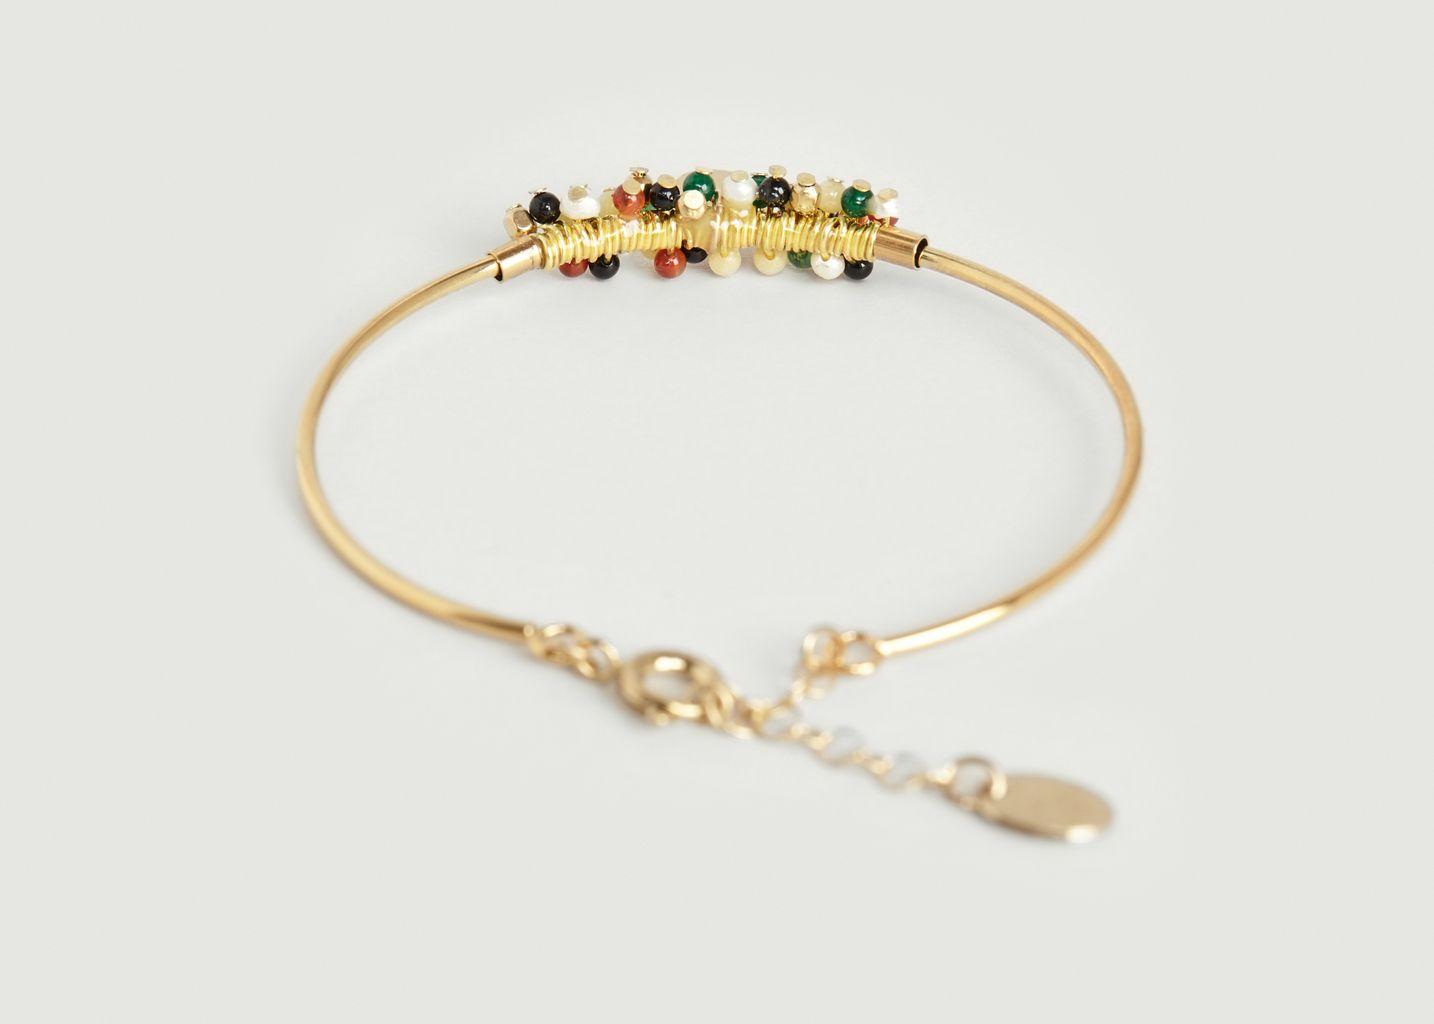 Bracelet Halo - Medecine Douce